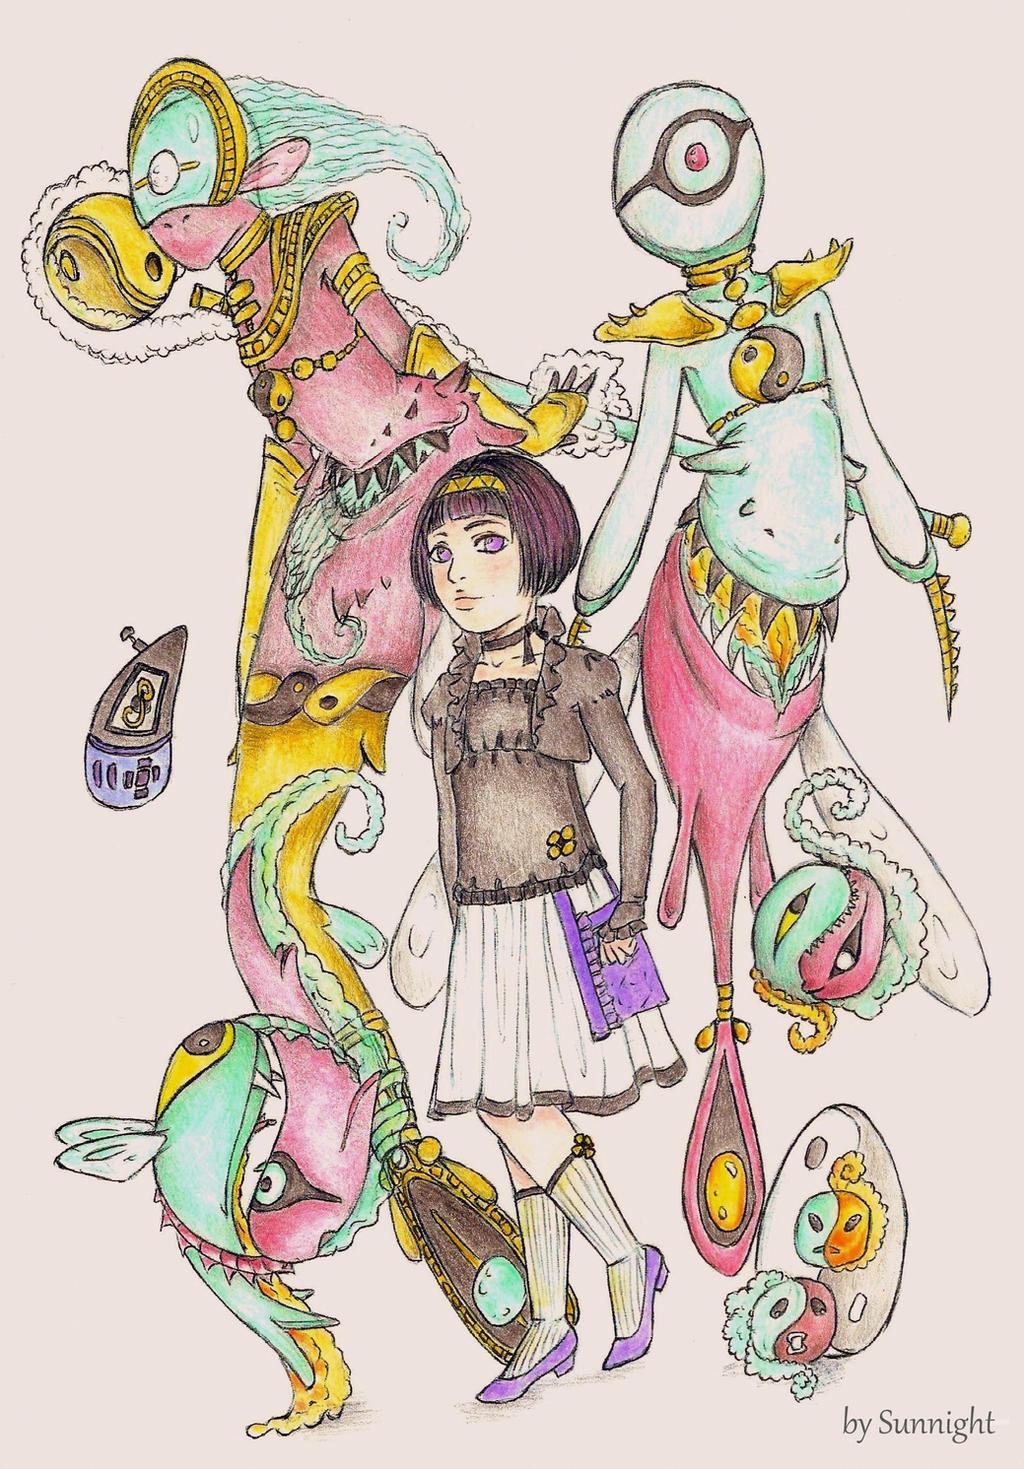 Chantal la Fee with their Digimon Harmoniamon colo by sunnight1